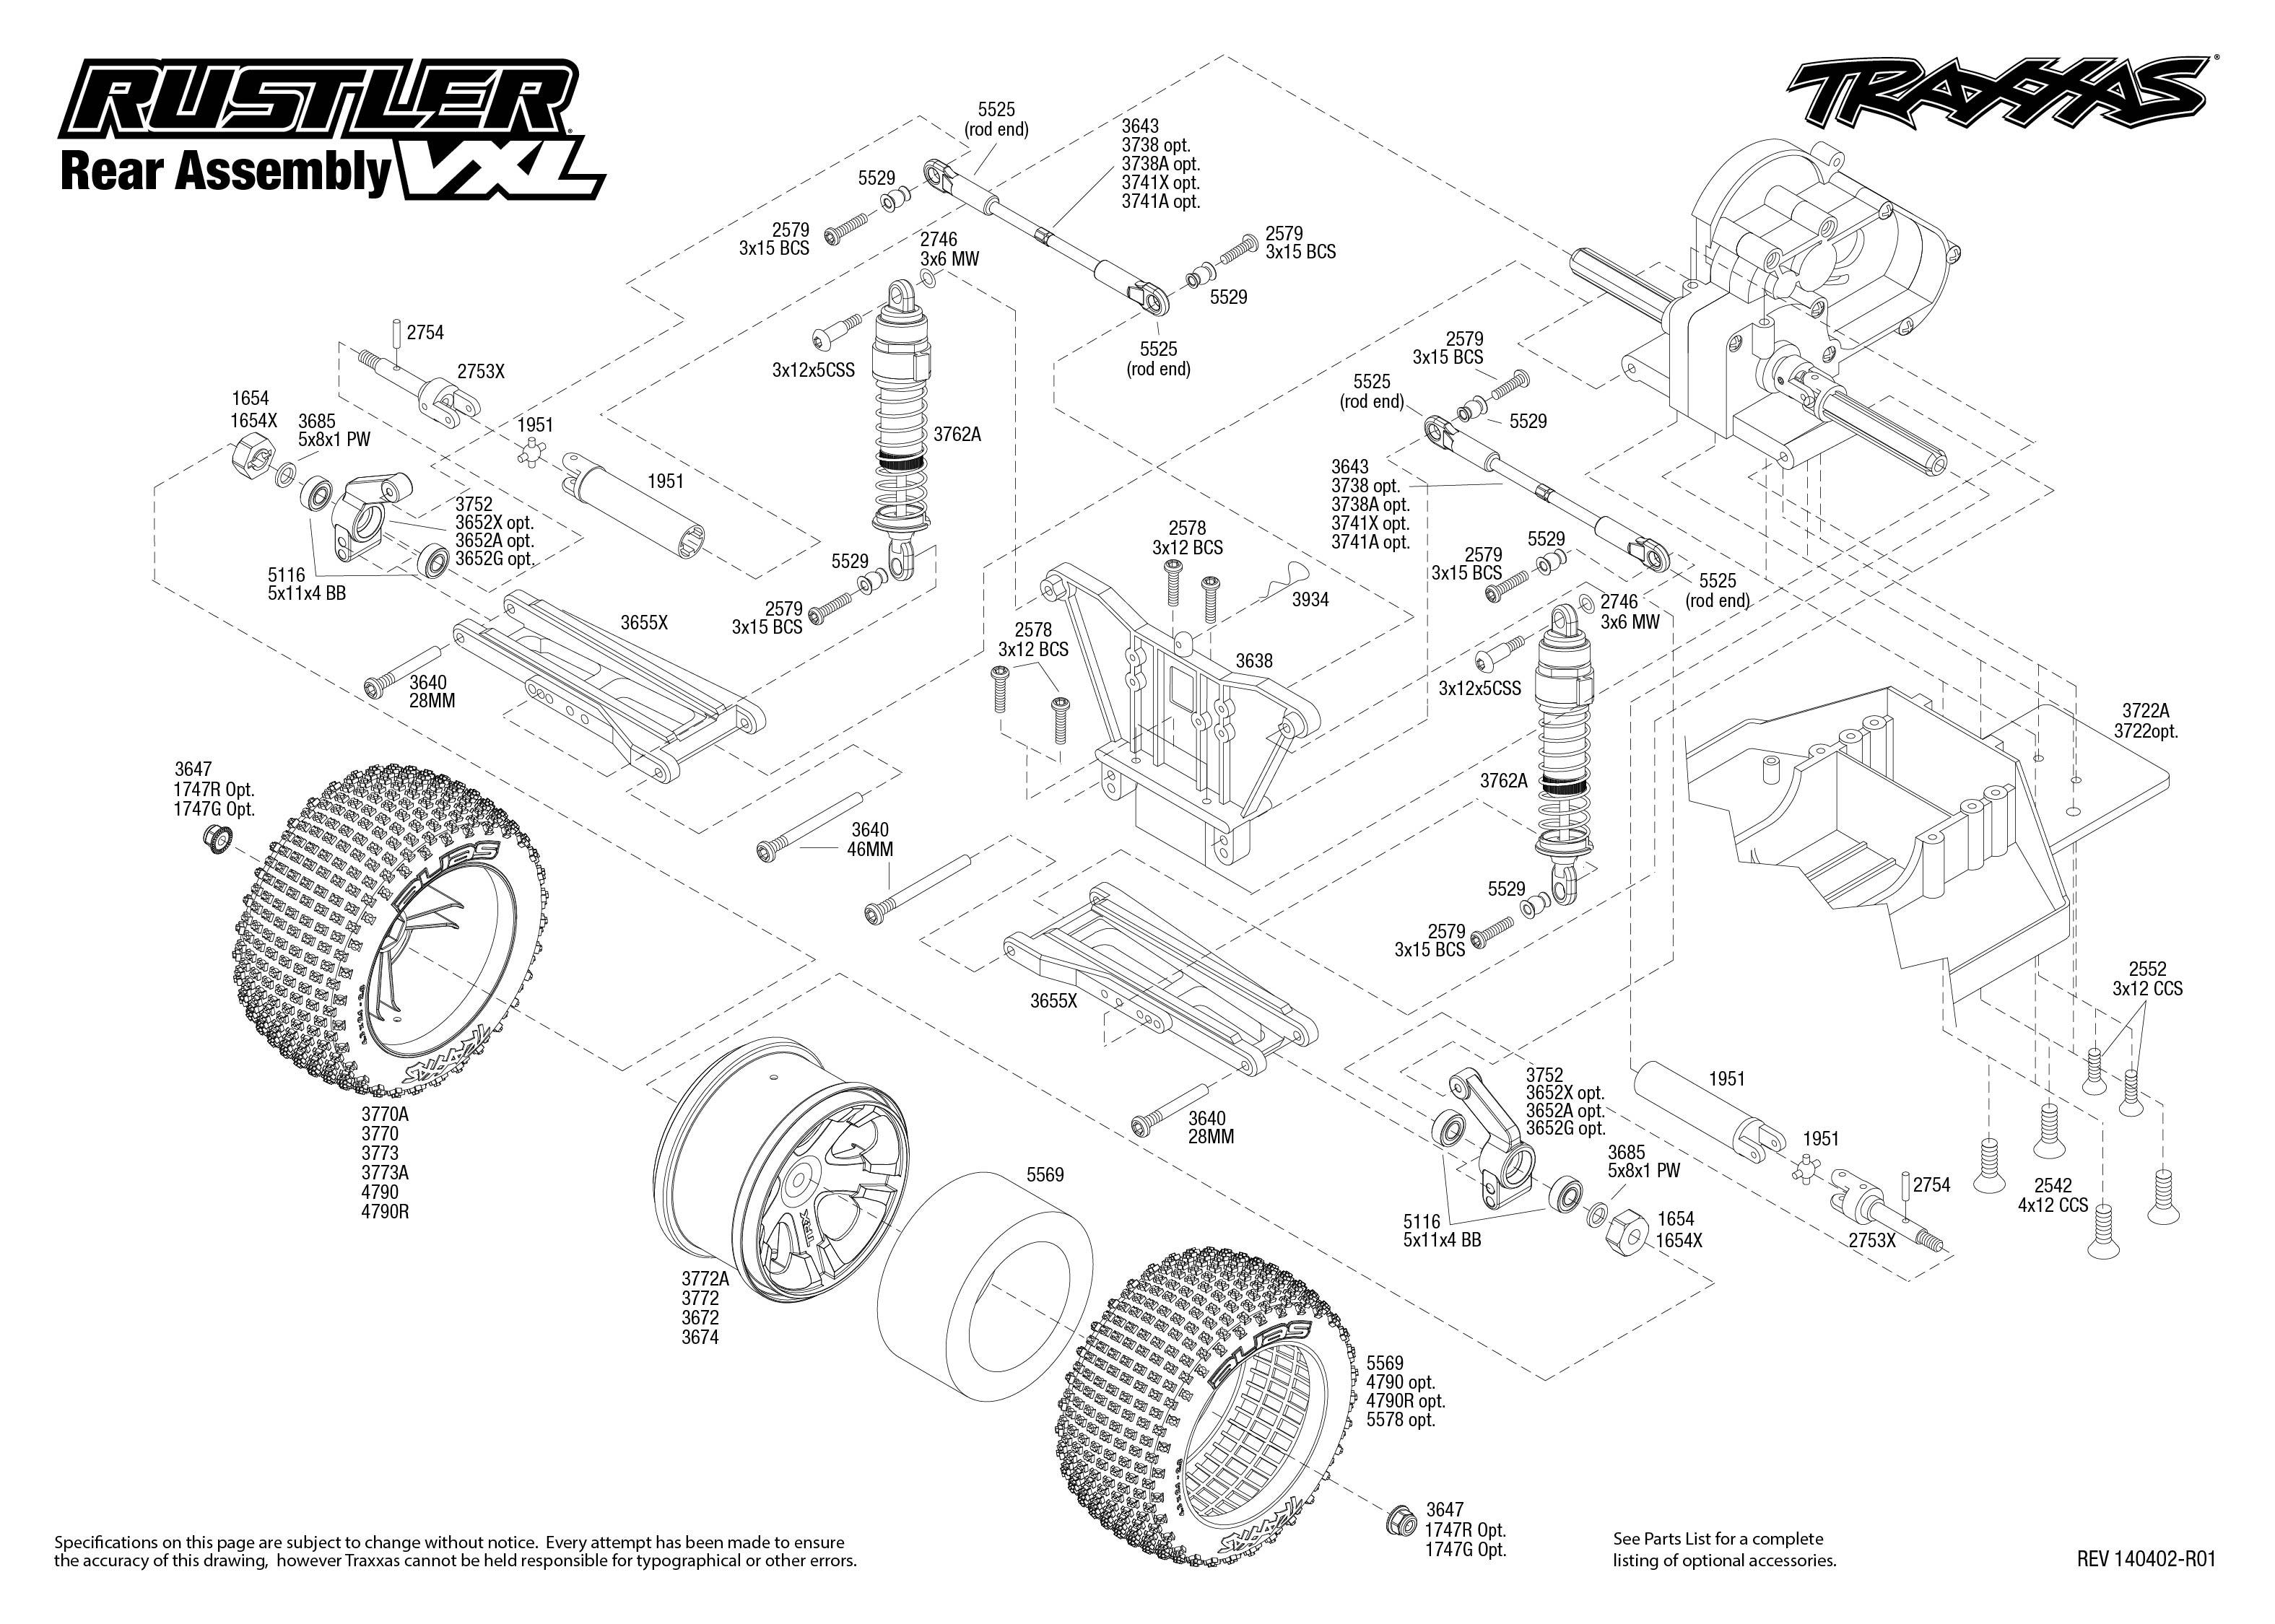 Rustler Vxl Rear Assembly